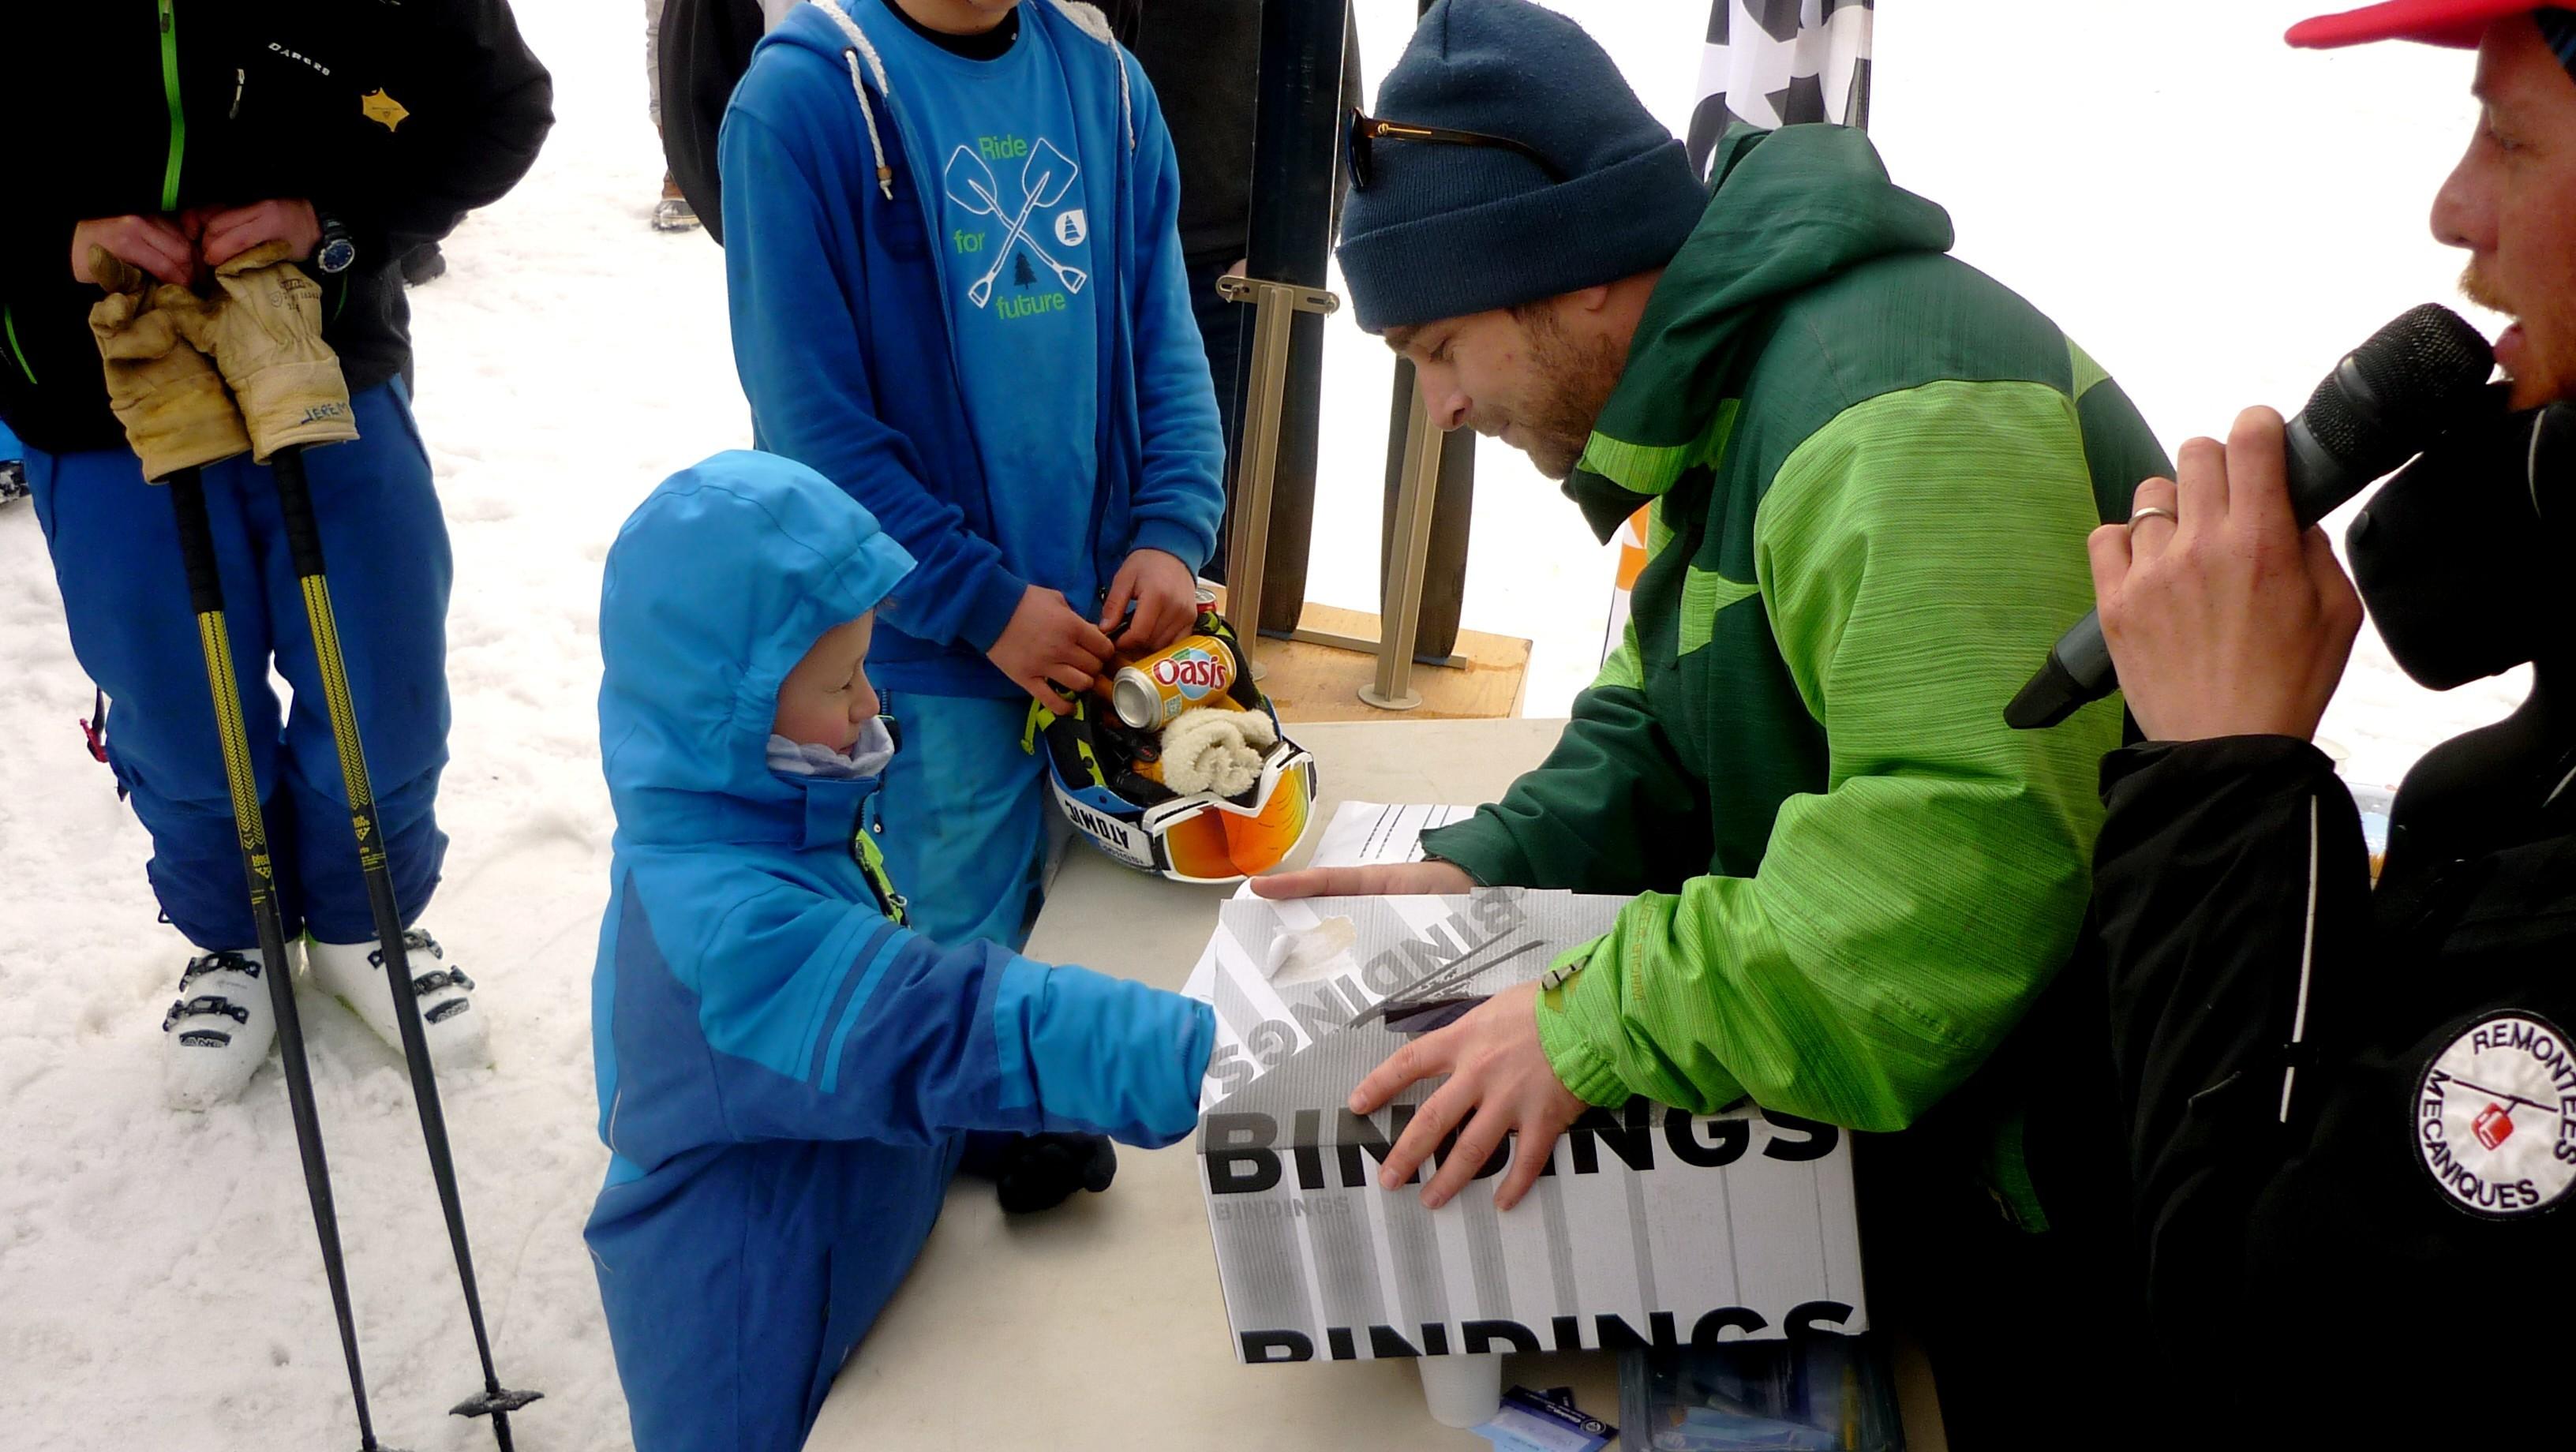 Tirage au sort gagnant ski Dynastar CHAM 97 - Derby du Mont Dore 2017